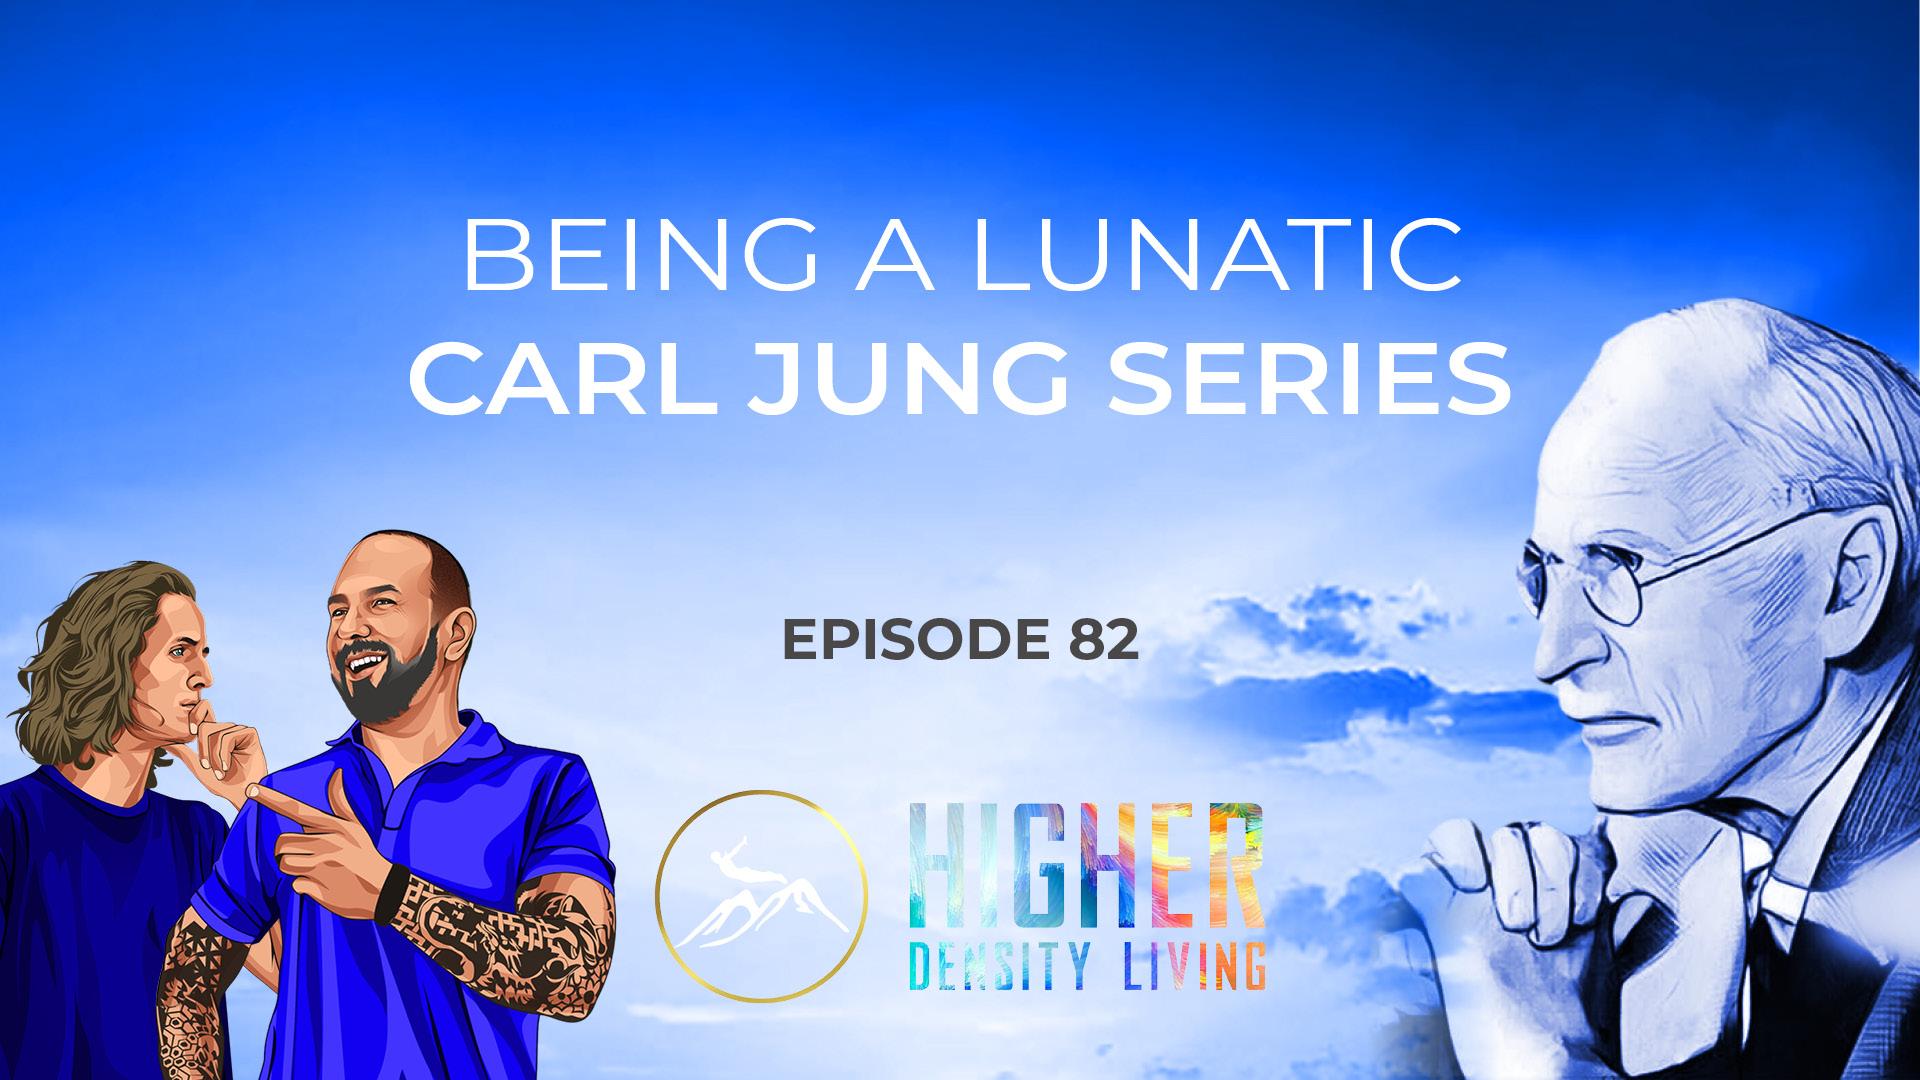 Being a Lunatic - Carl Jung Series